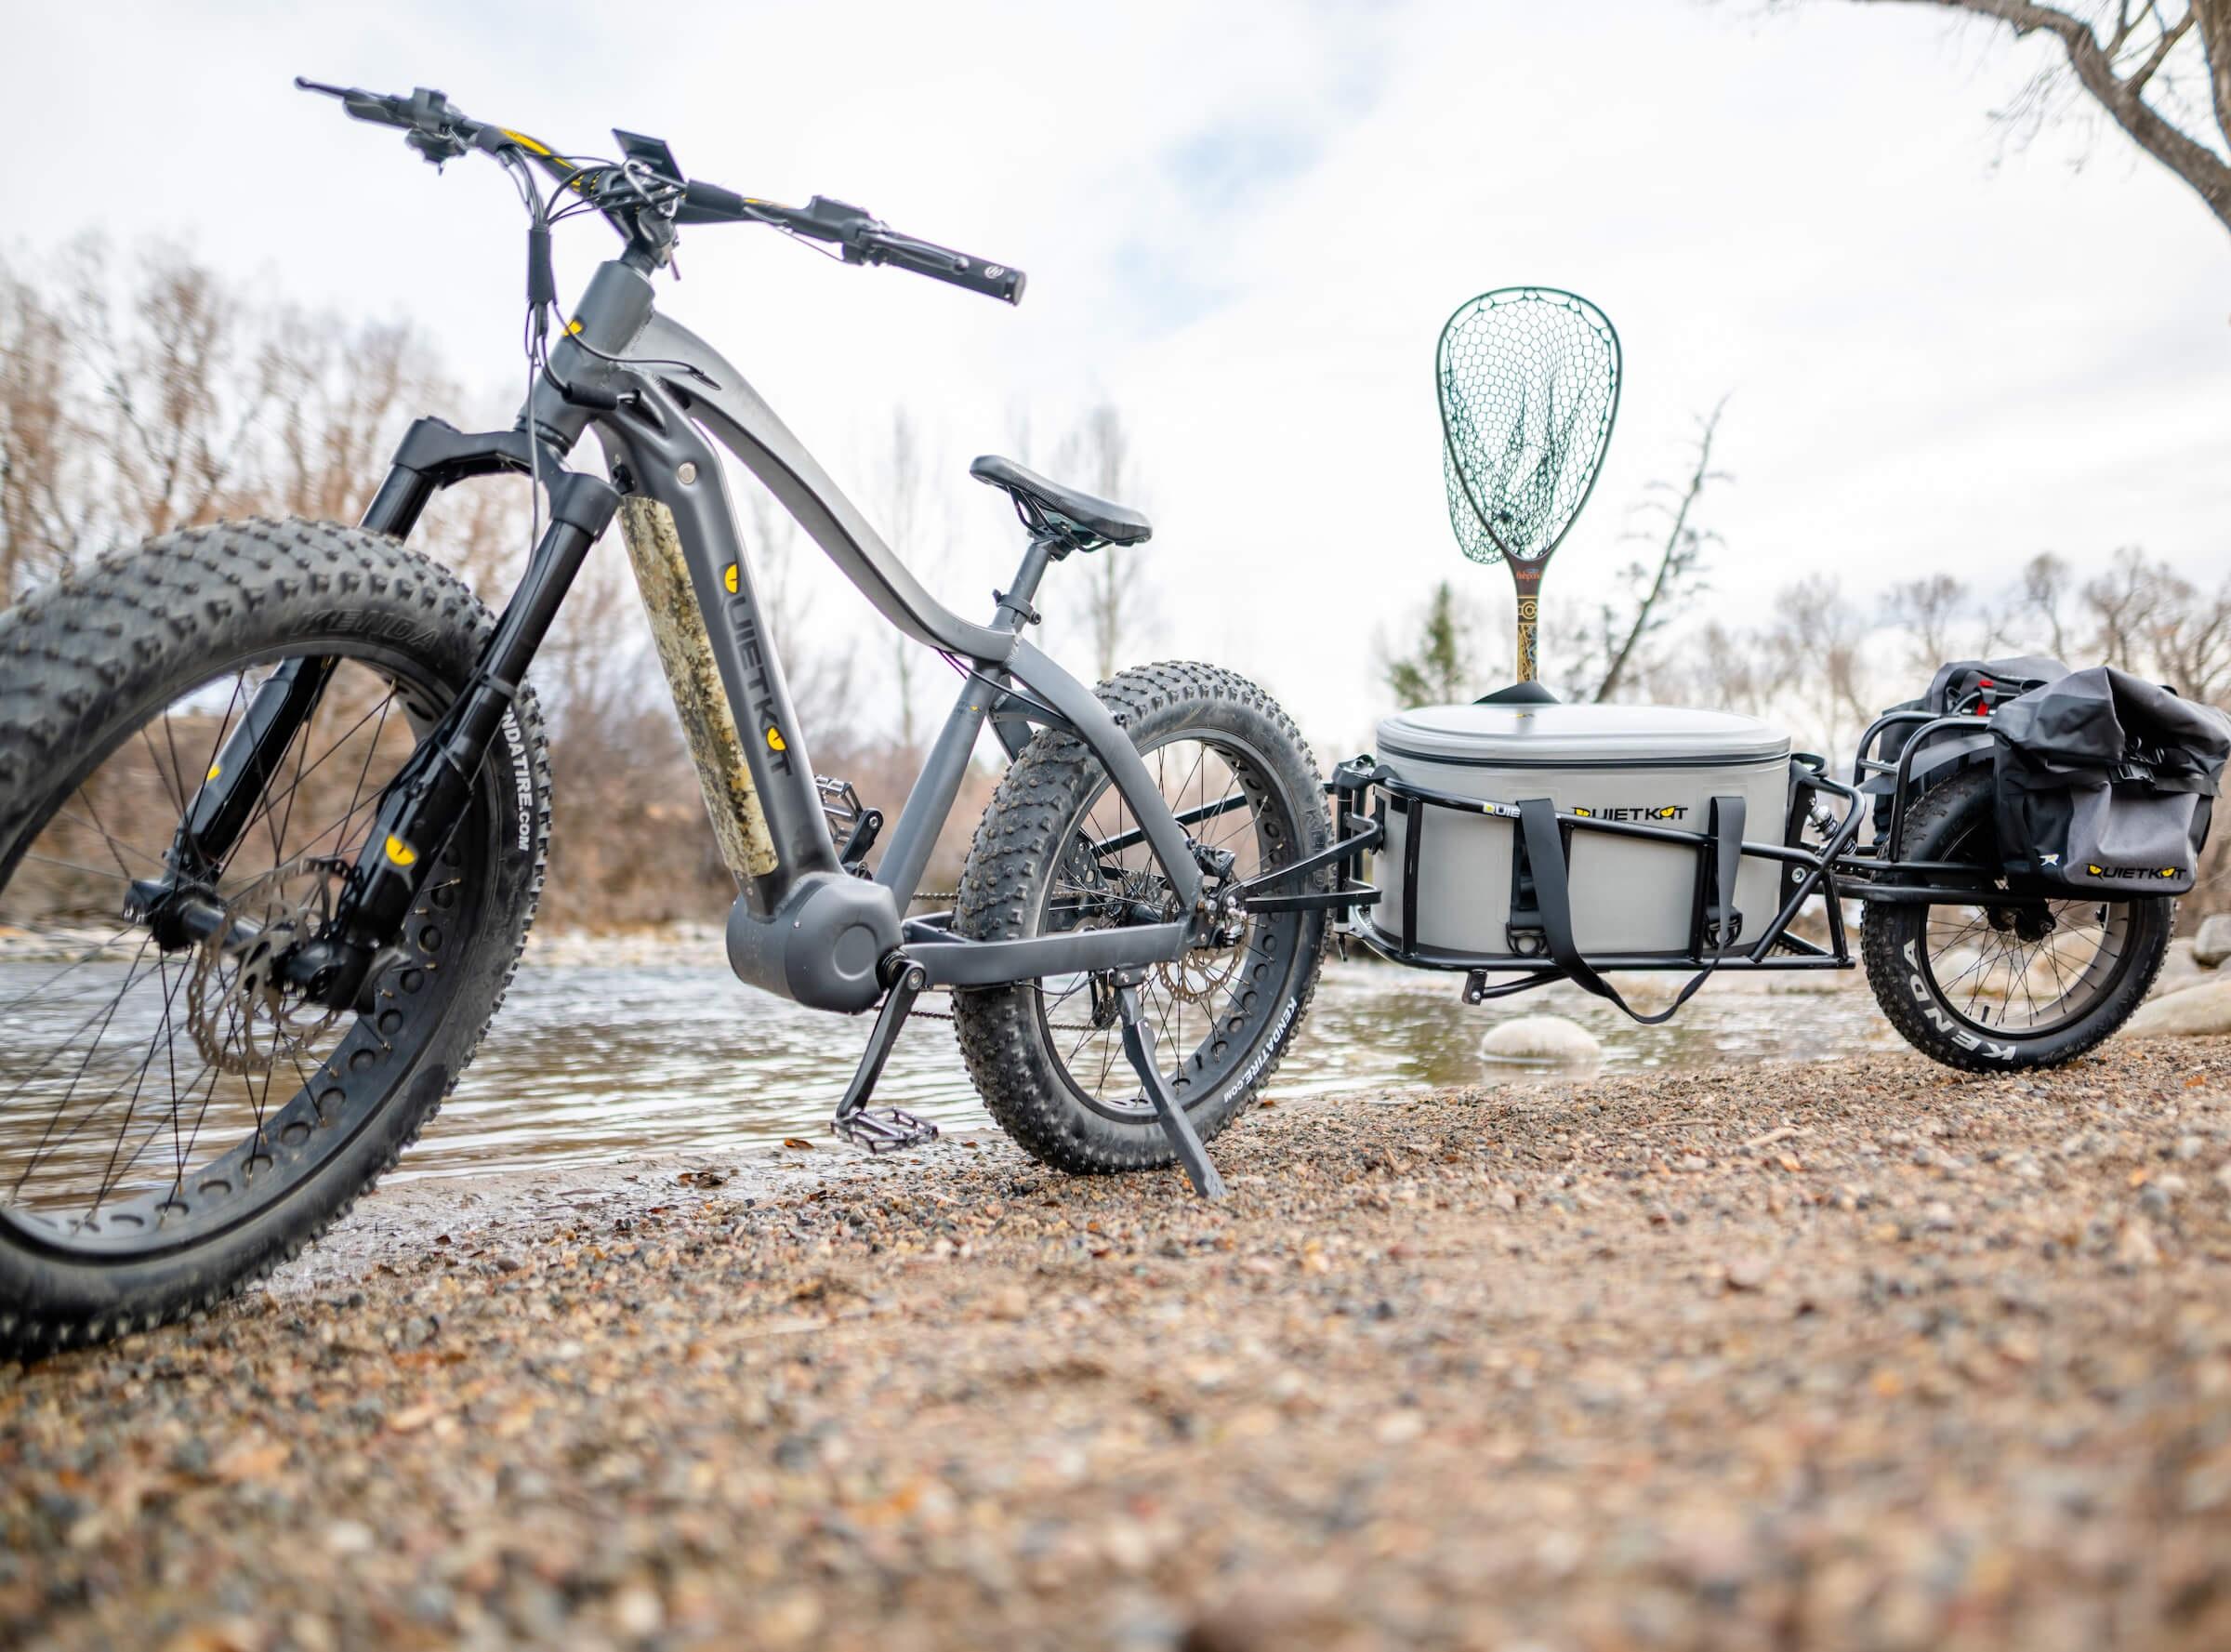 QuietKat Ranger e-bike review